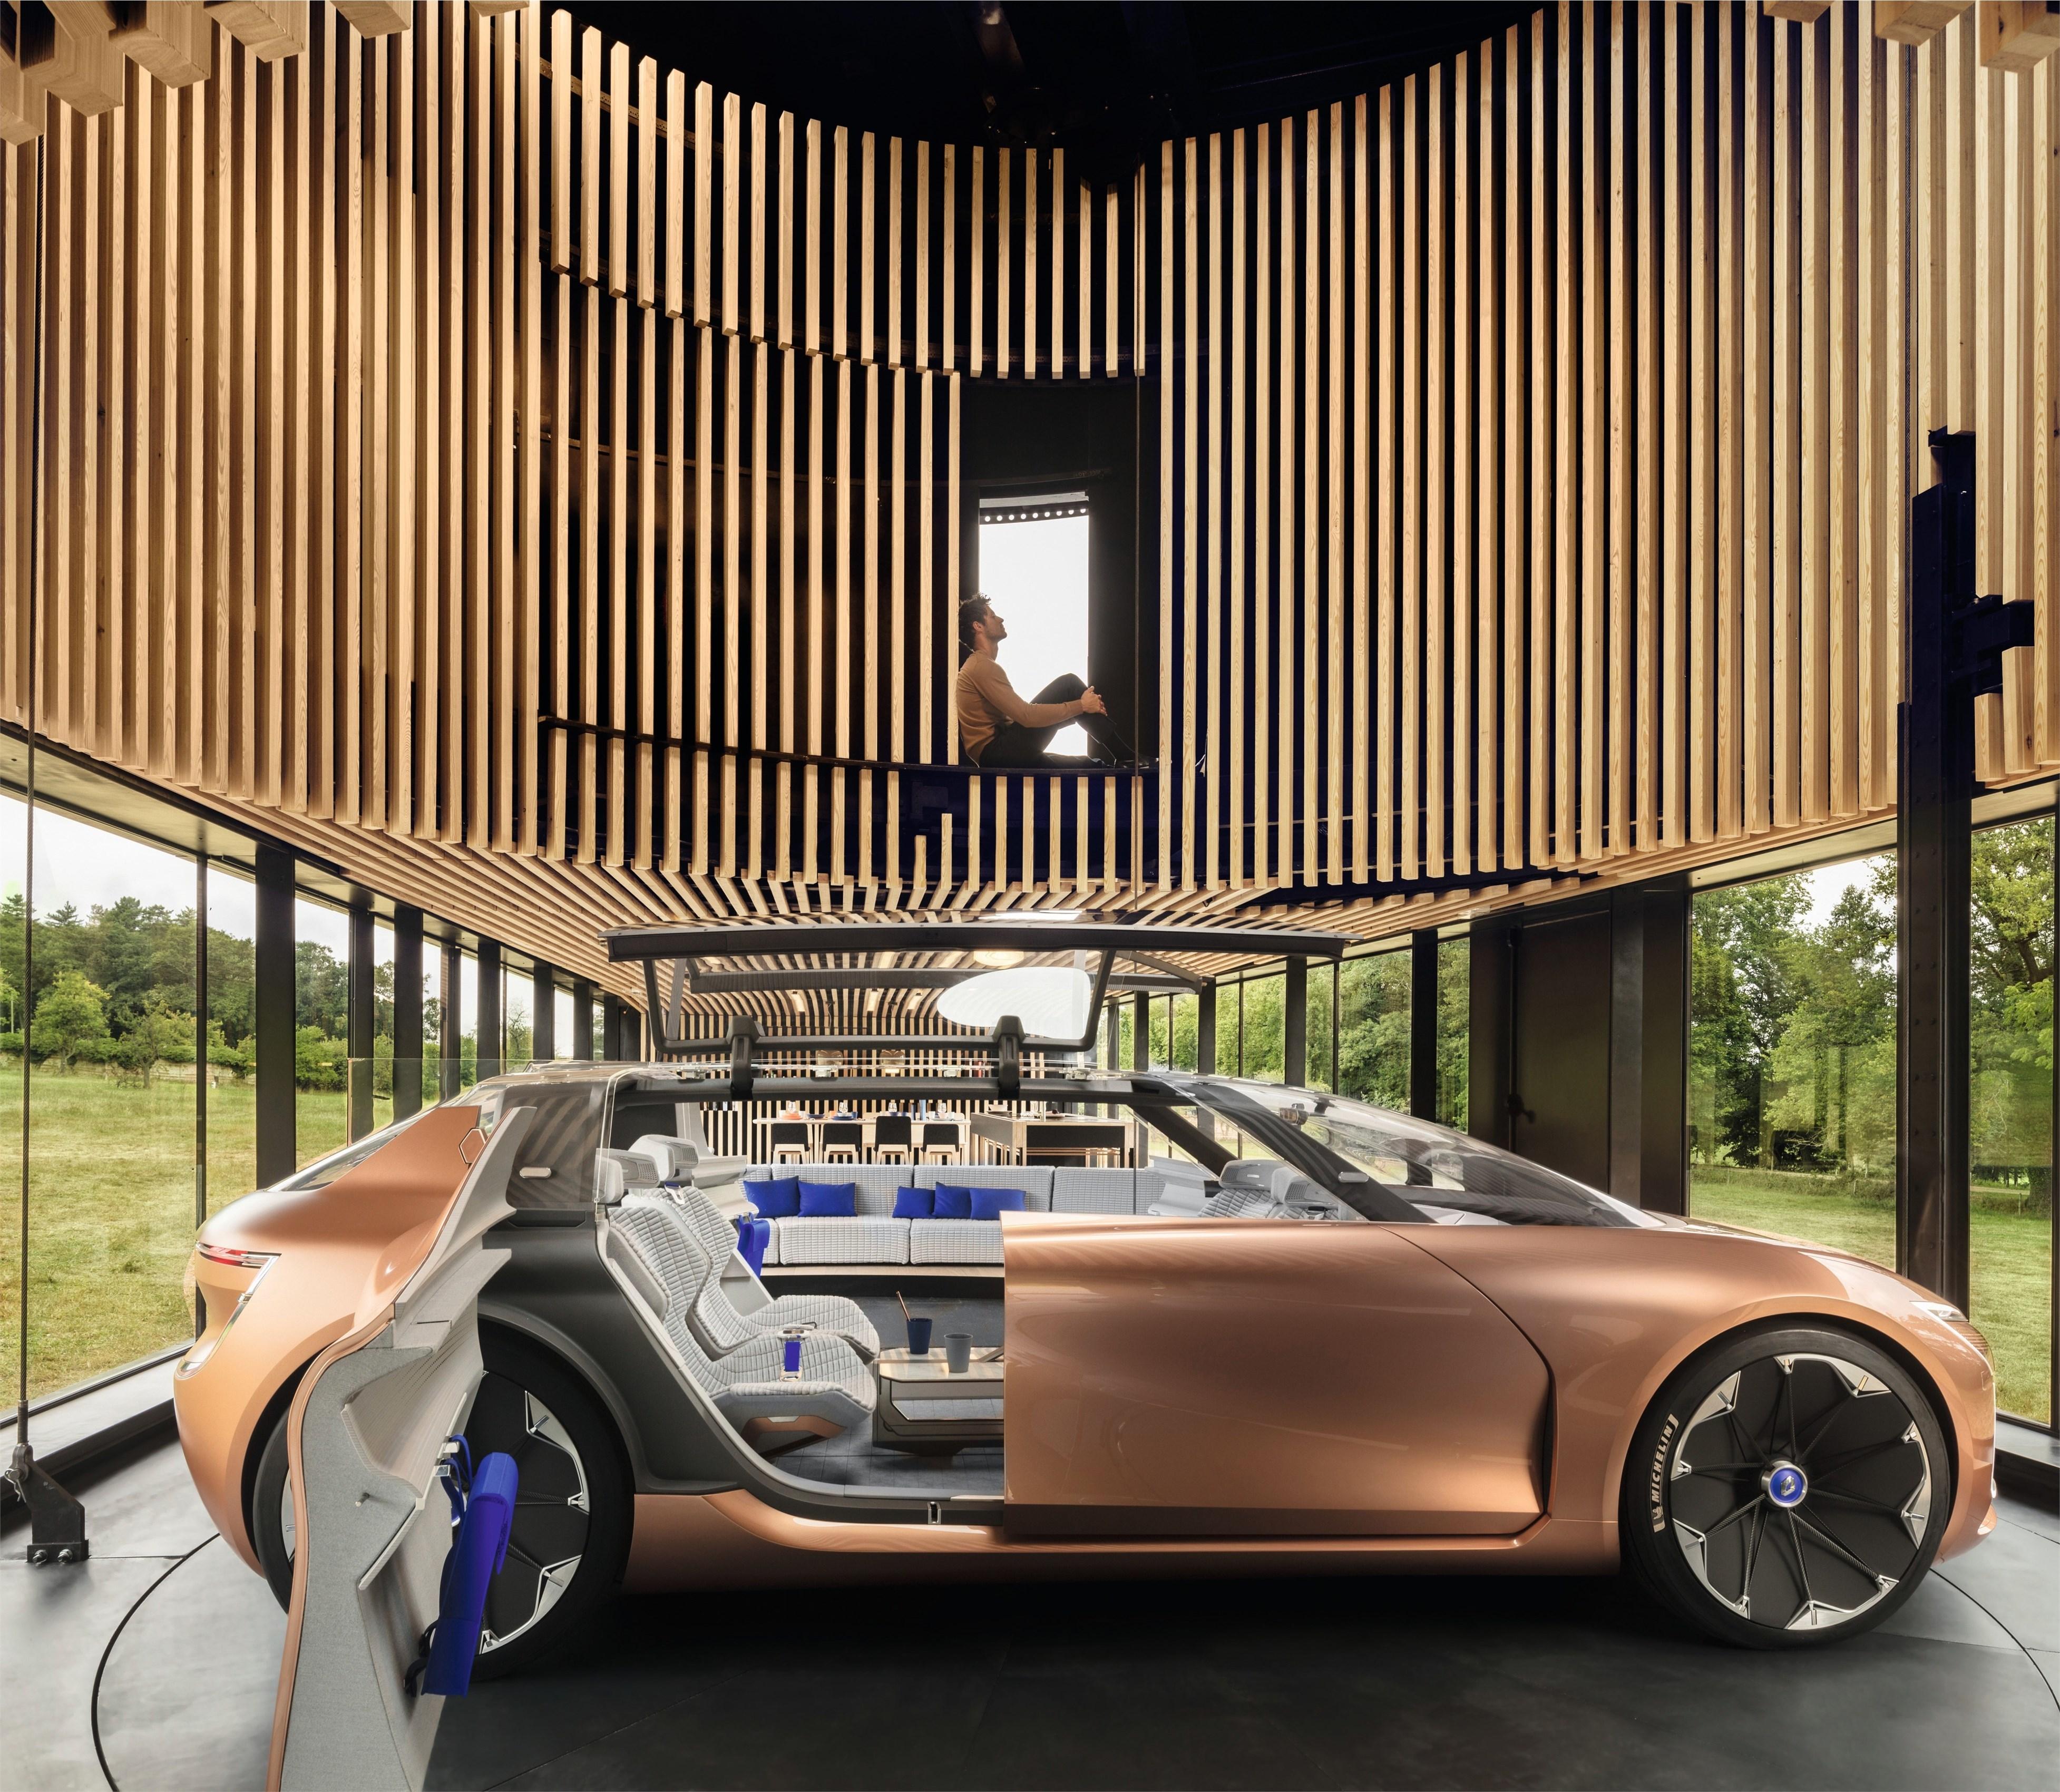 The Renault Concept car \